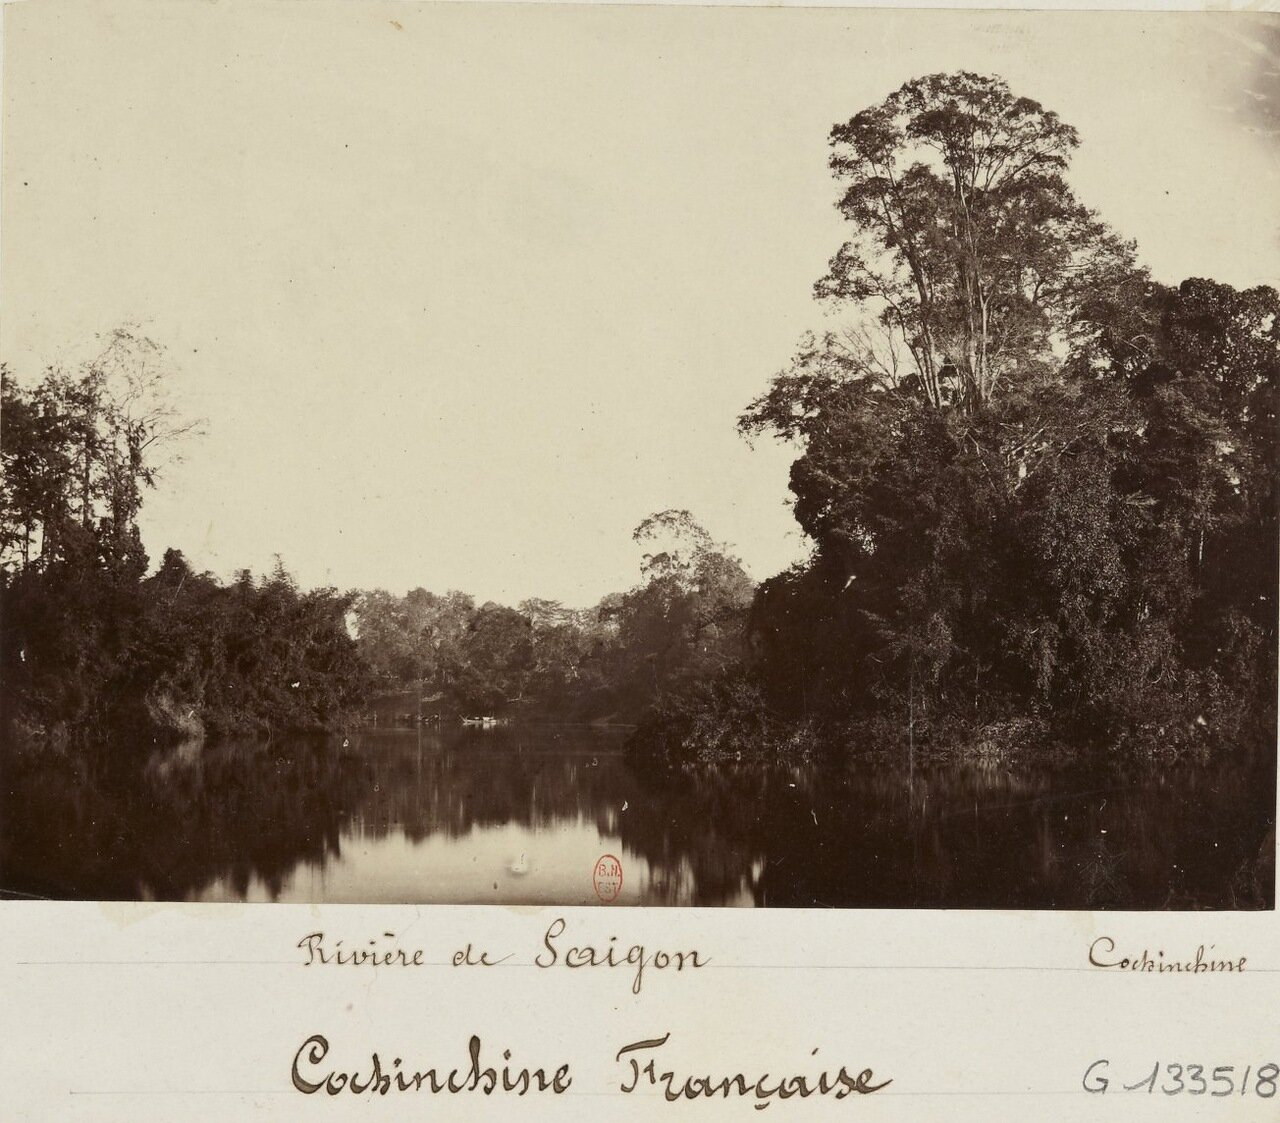 Французская Кохинхина. На реке Сайгон